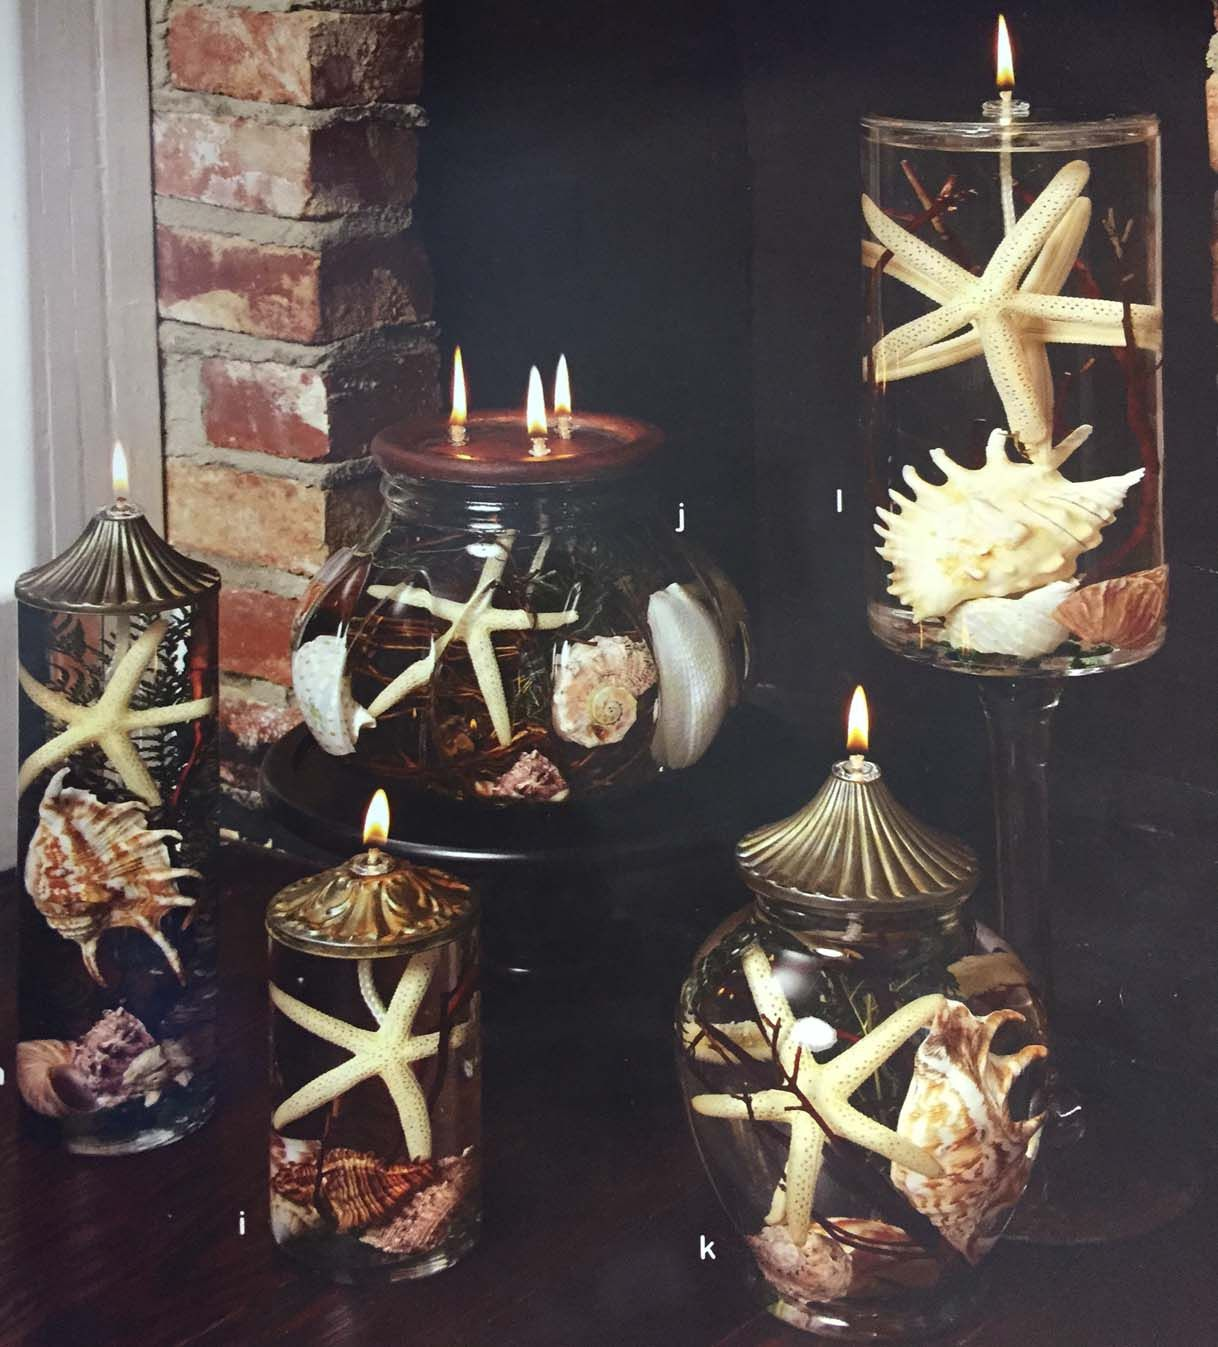 A lifetime candle seashells lifetime candles flowers